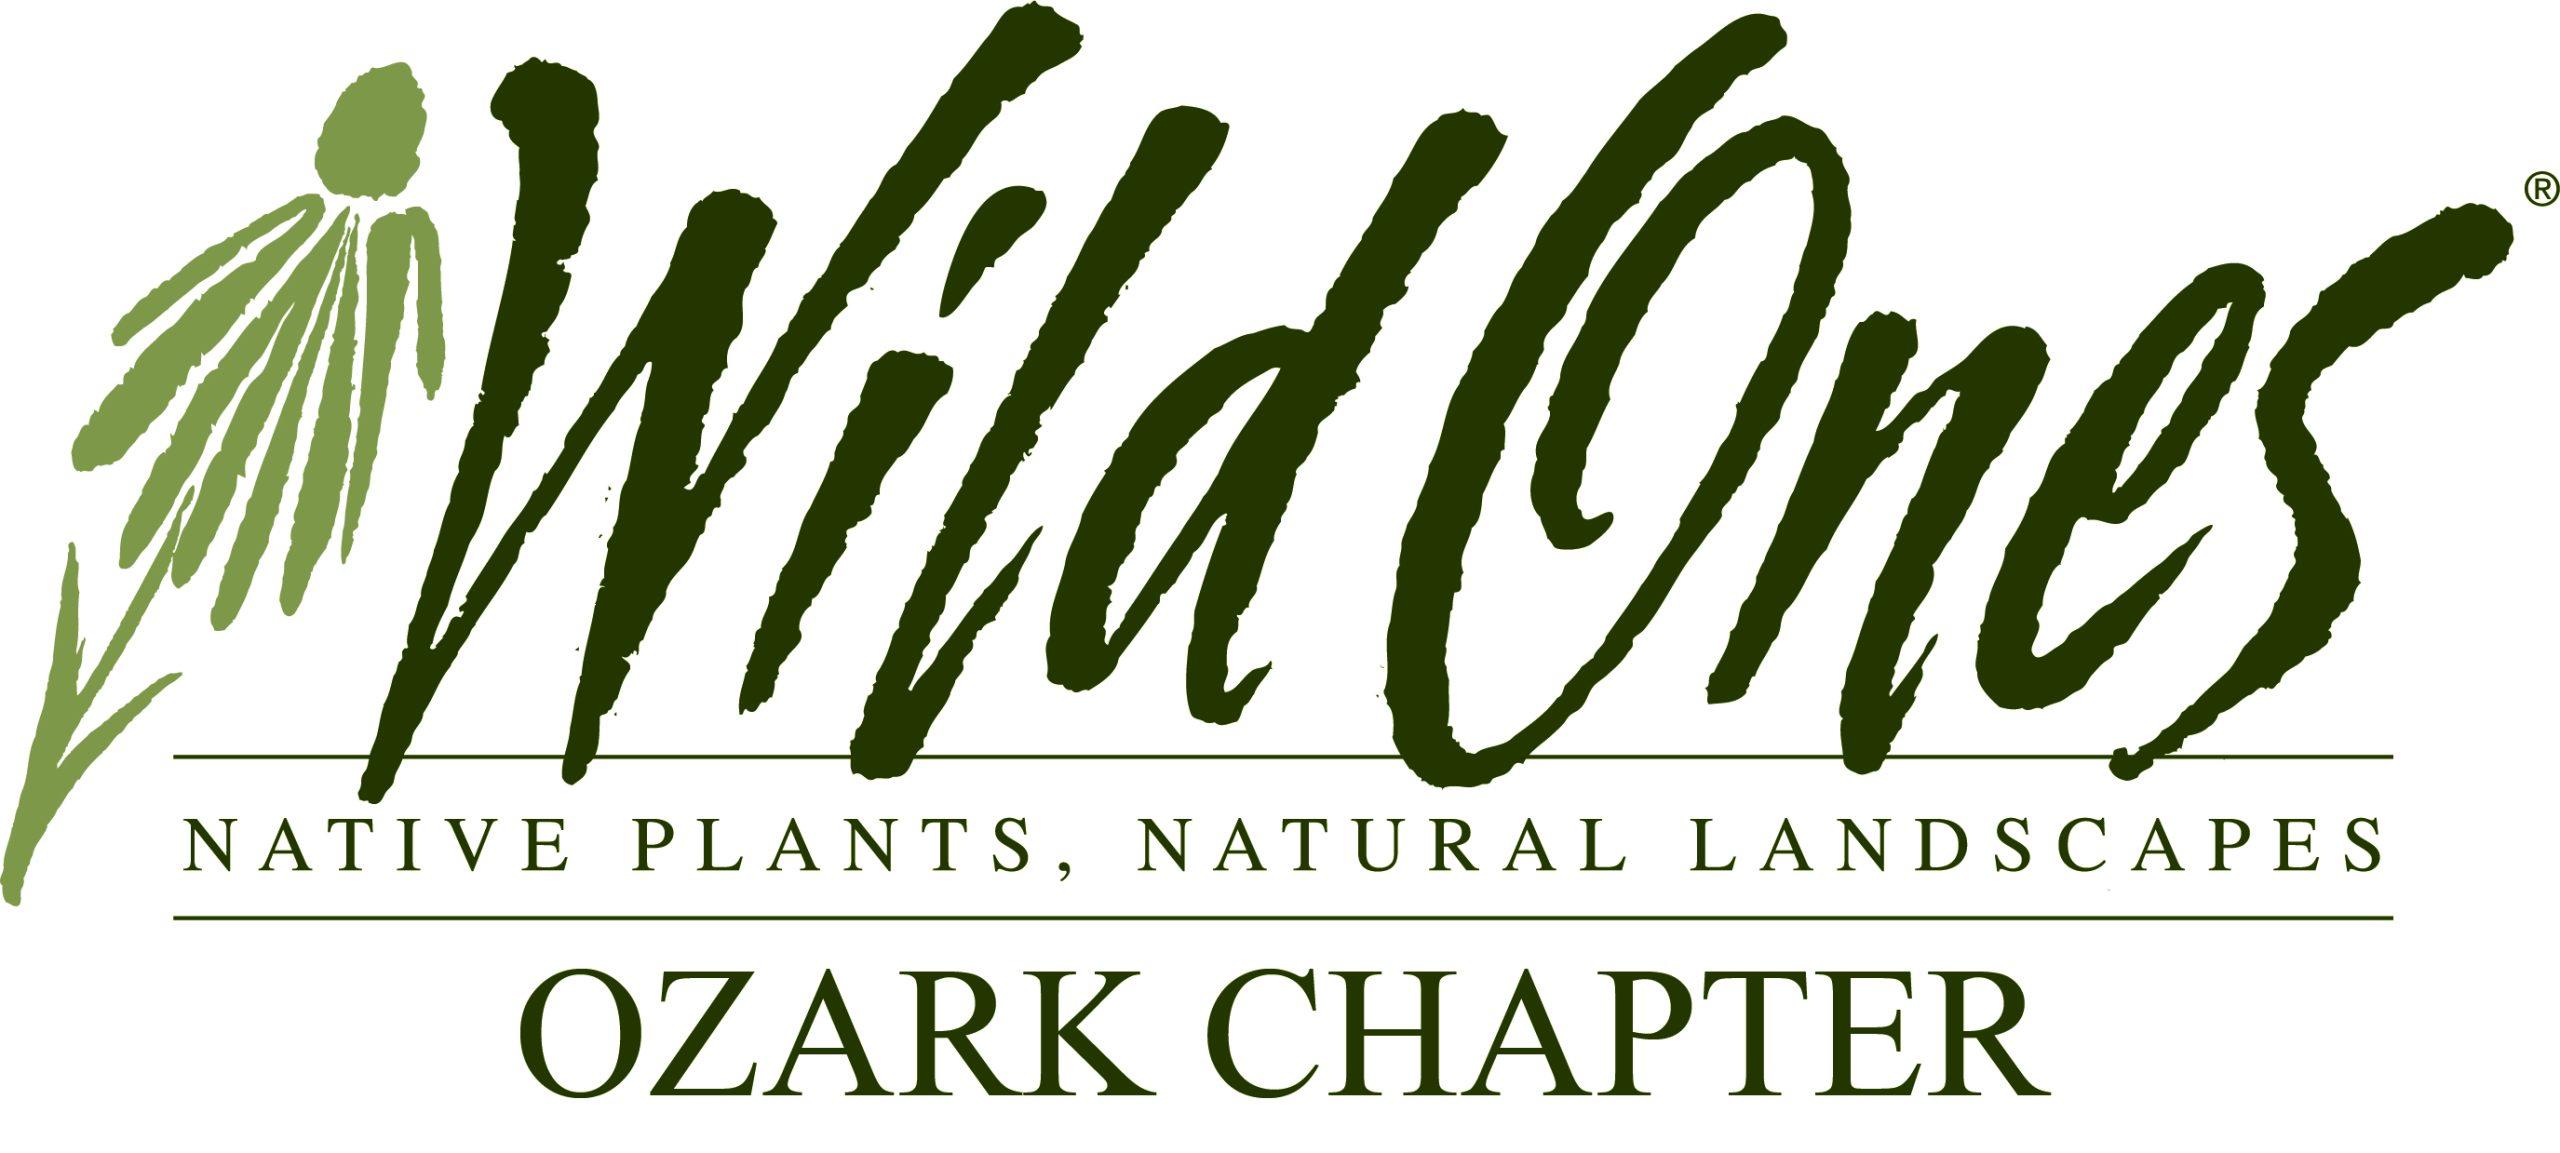 Wild Ones - Ozark Chapter logo